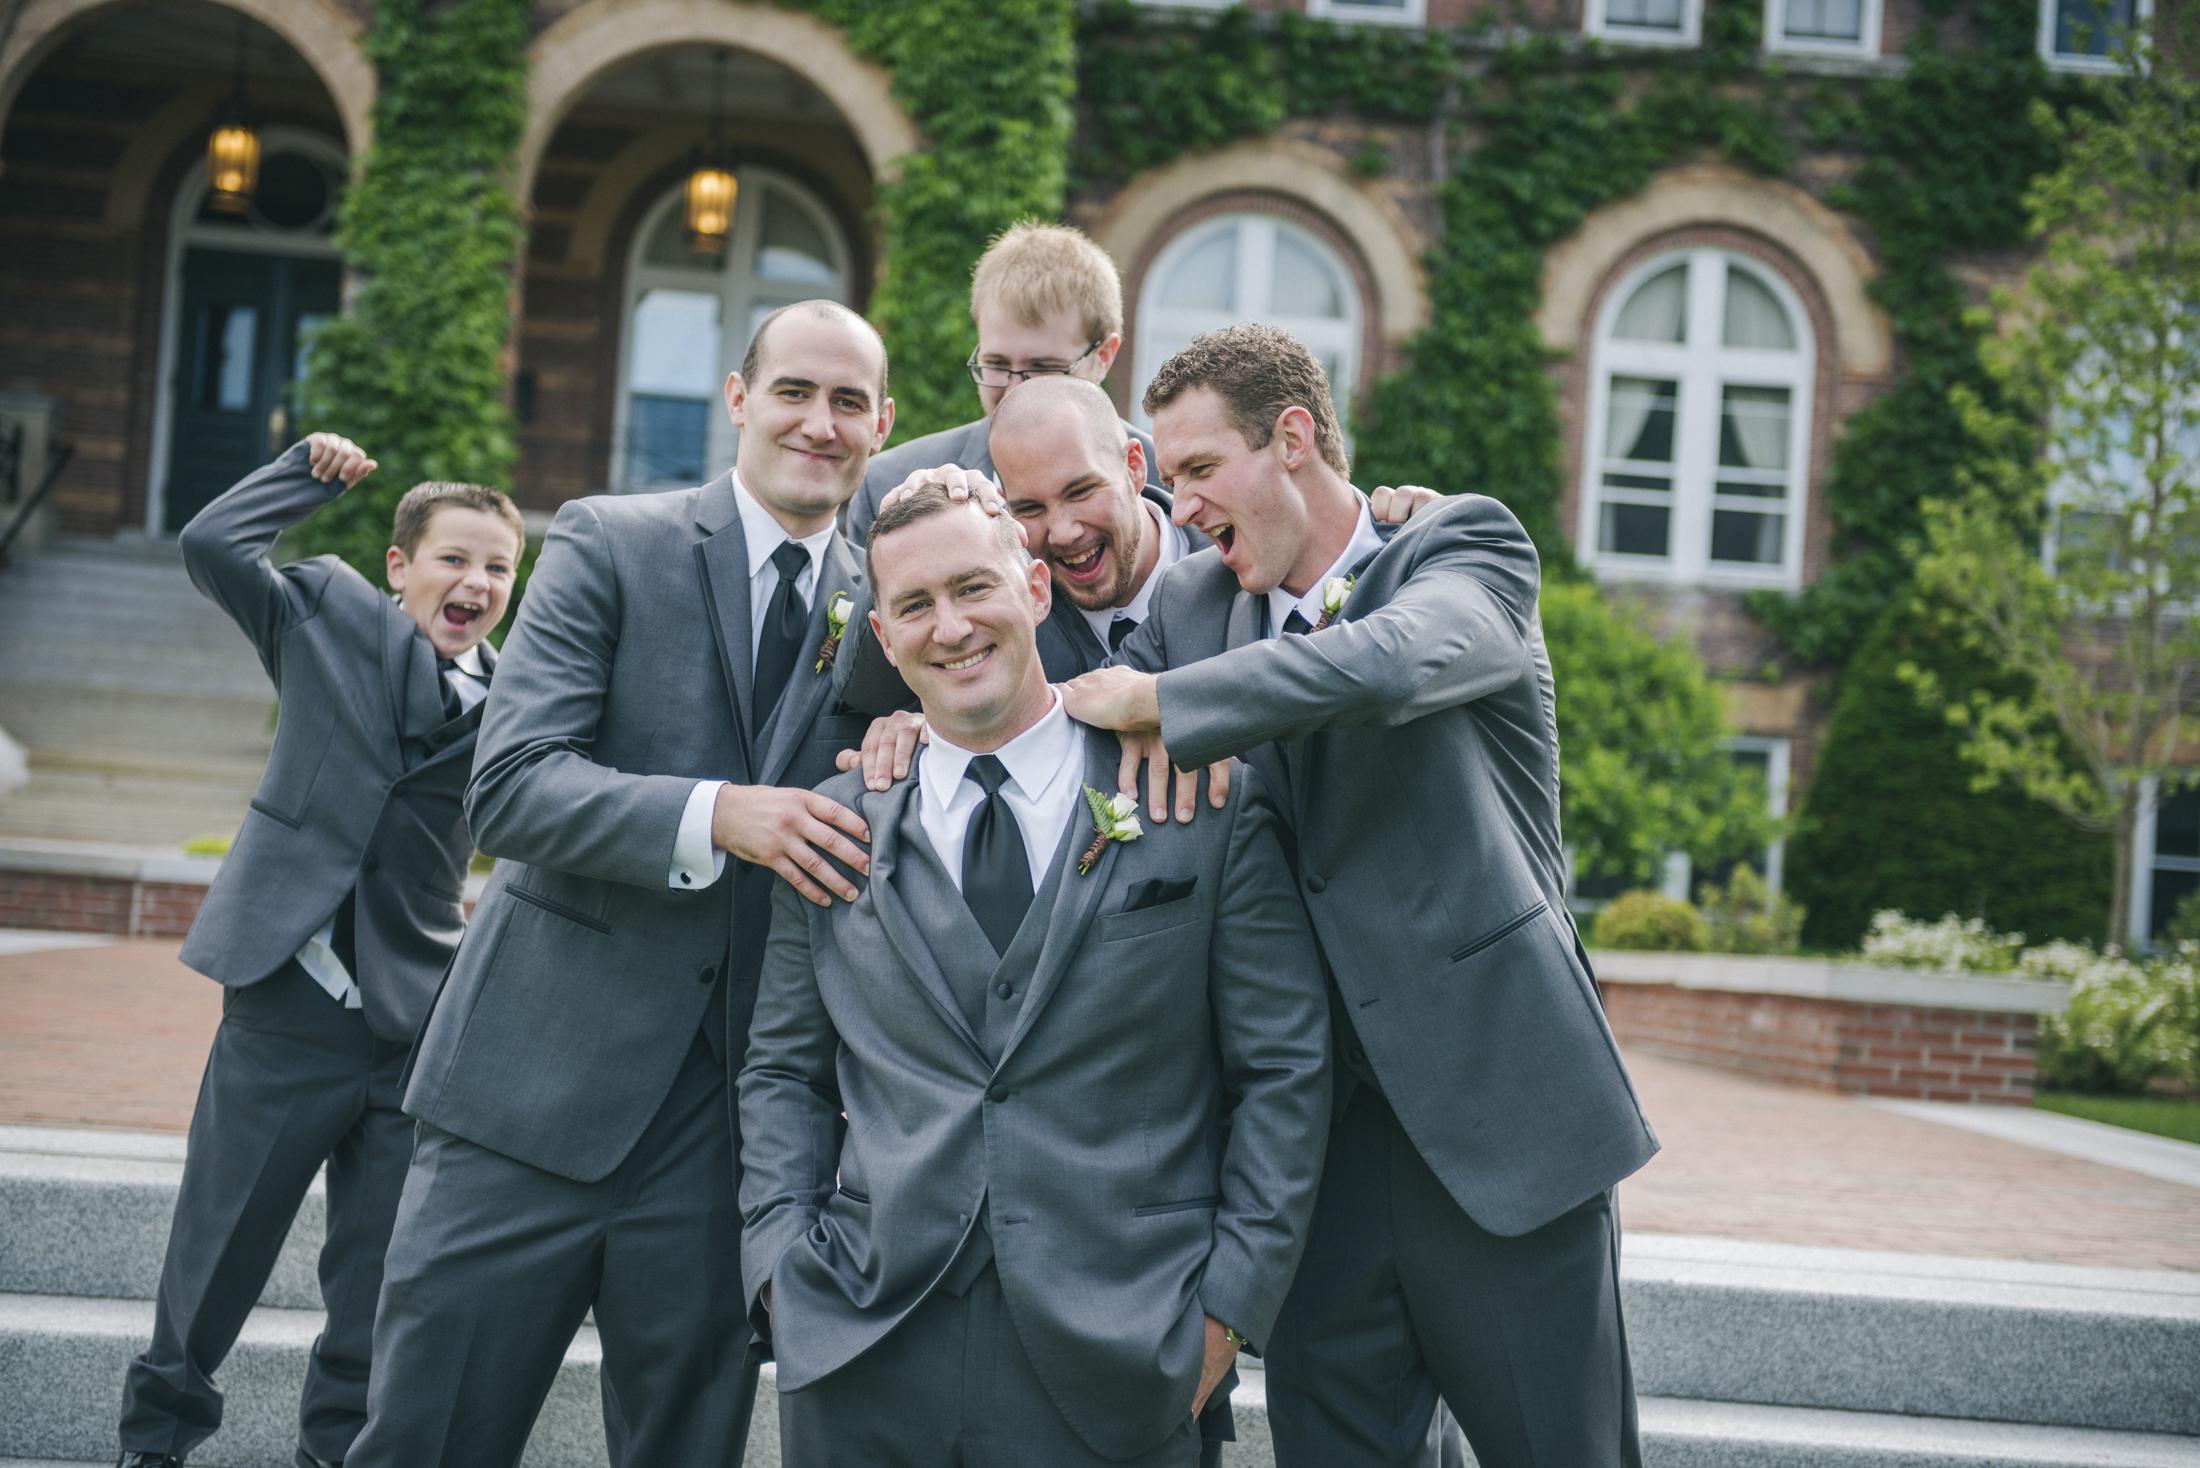 NH Wedding Photographer: groomsmen at Saint Anselm College